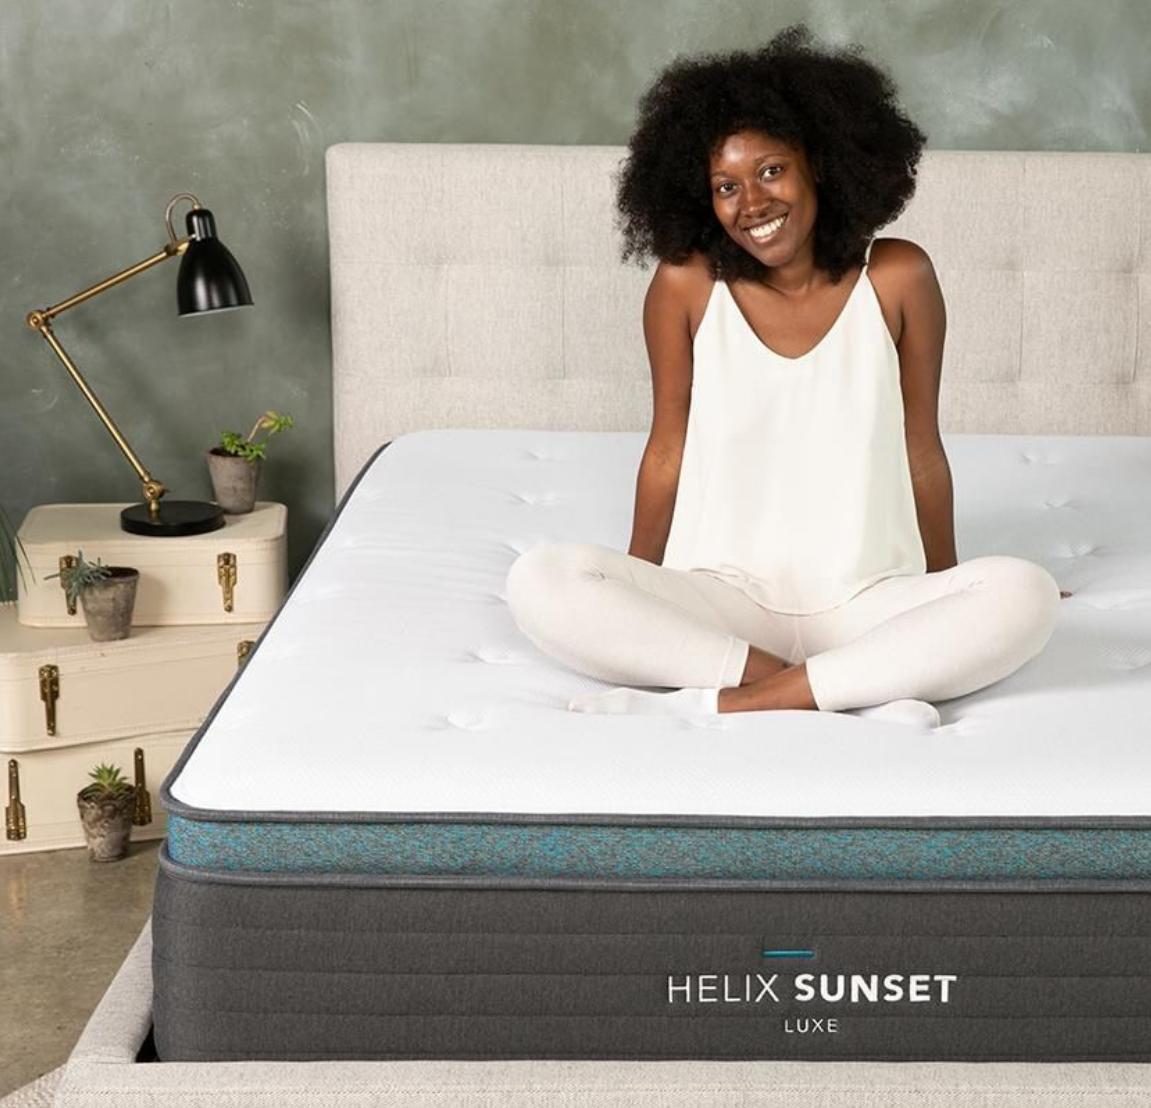 helix luxe mattress at a glance